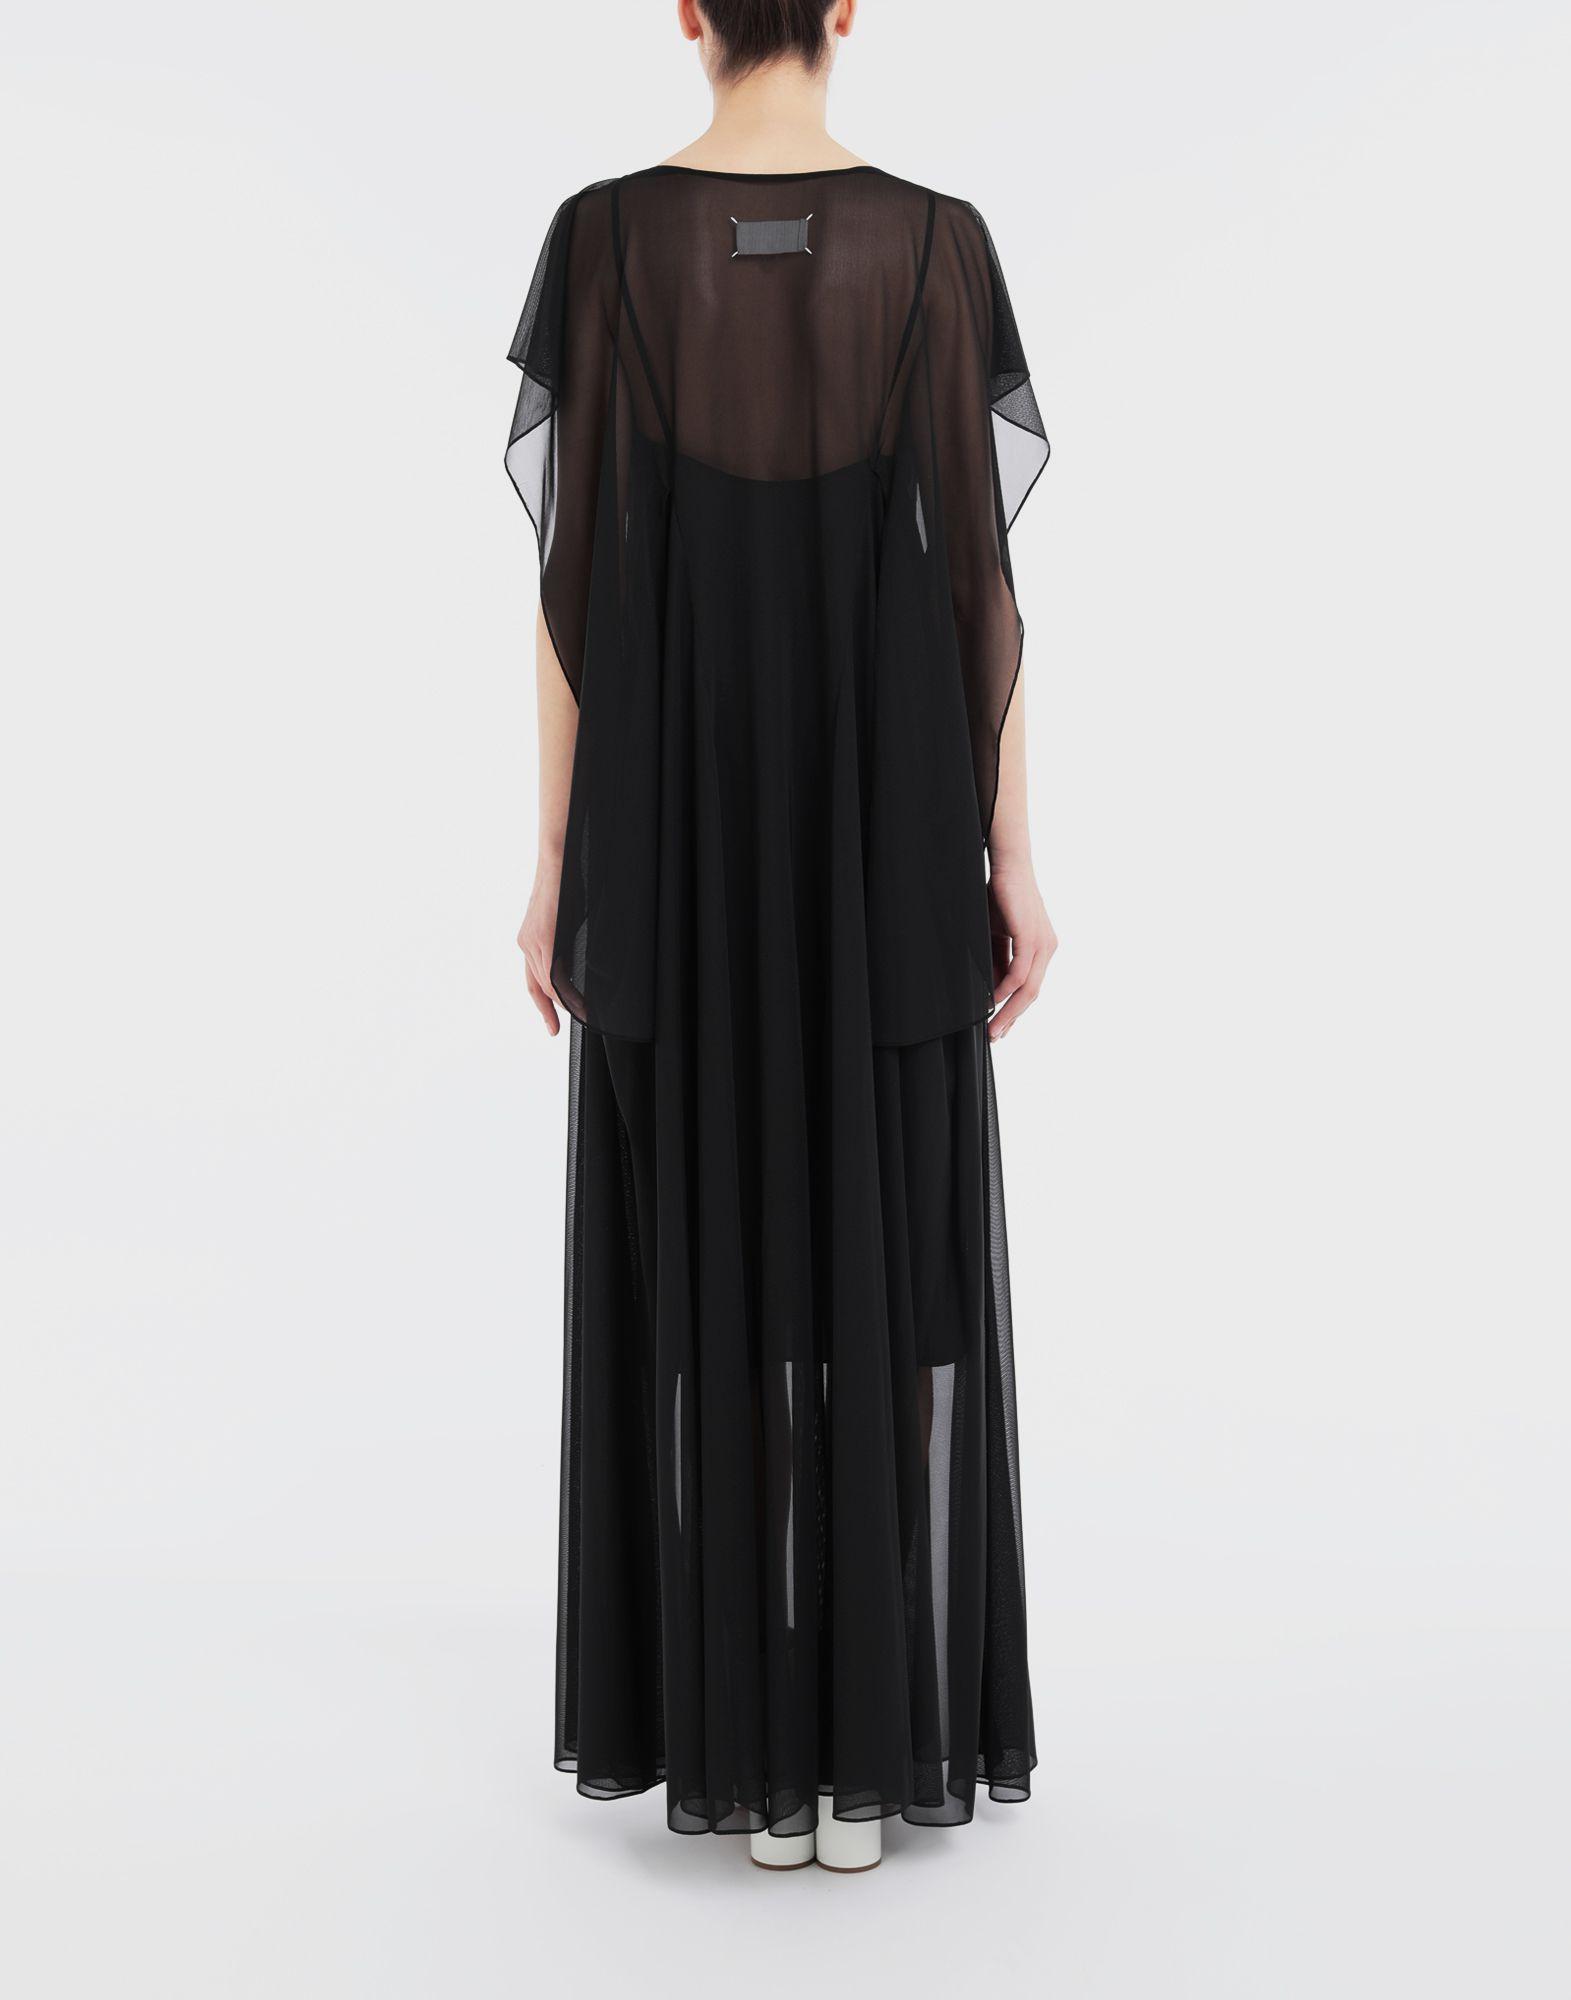 MAISON MARGIELA Sheer jersey dress Long dress Woman e